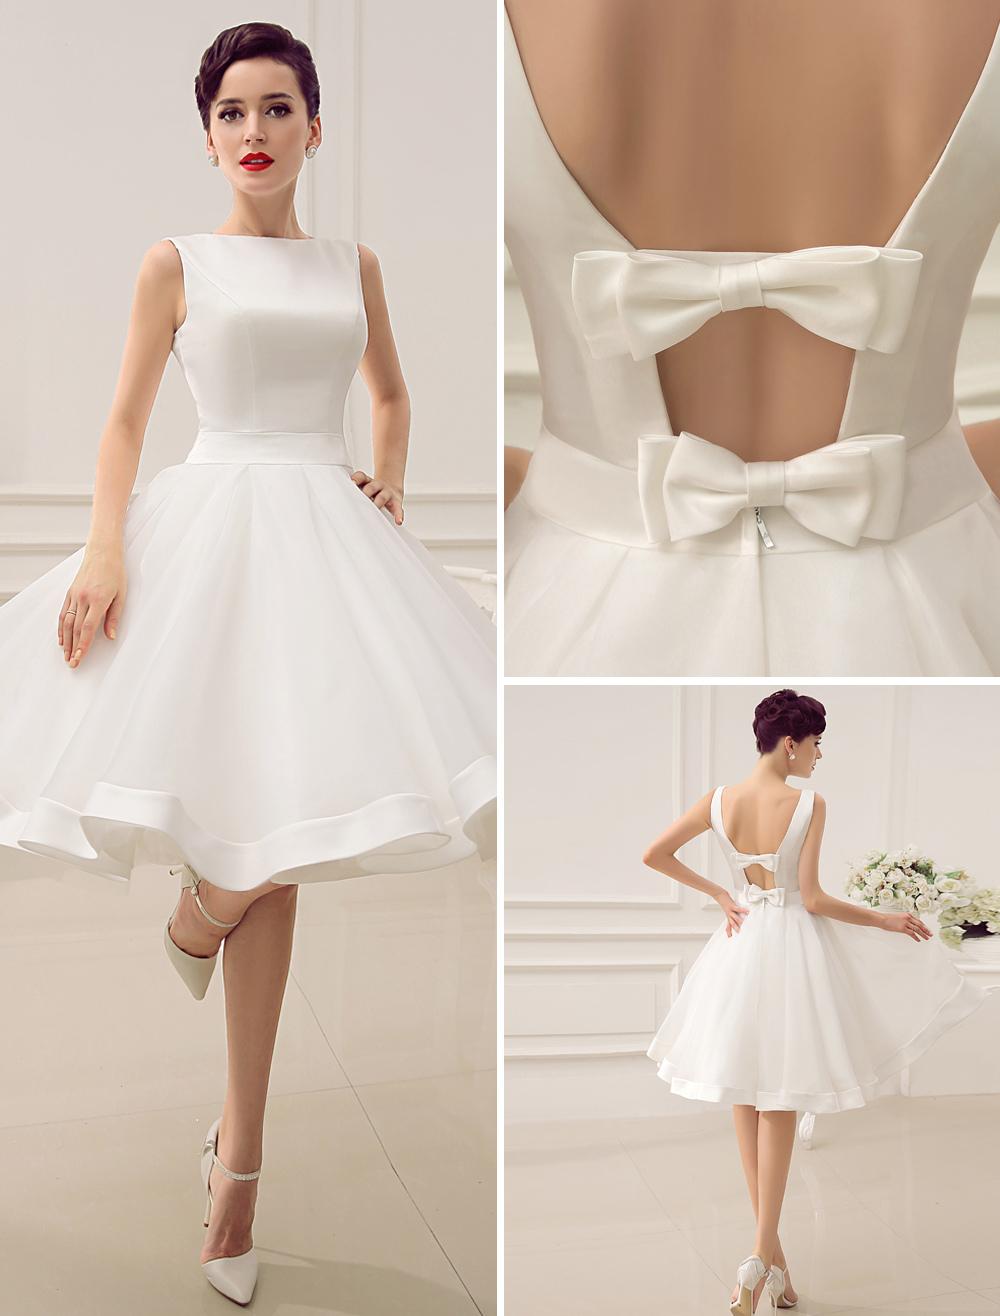 Cheap Wedding Dresses online wedding dress Off The Shoulder 3 4 Length Sleeves Lace Up Mermaid Wedding